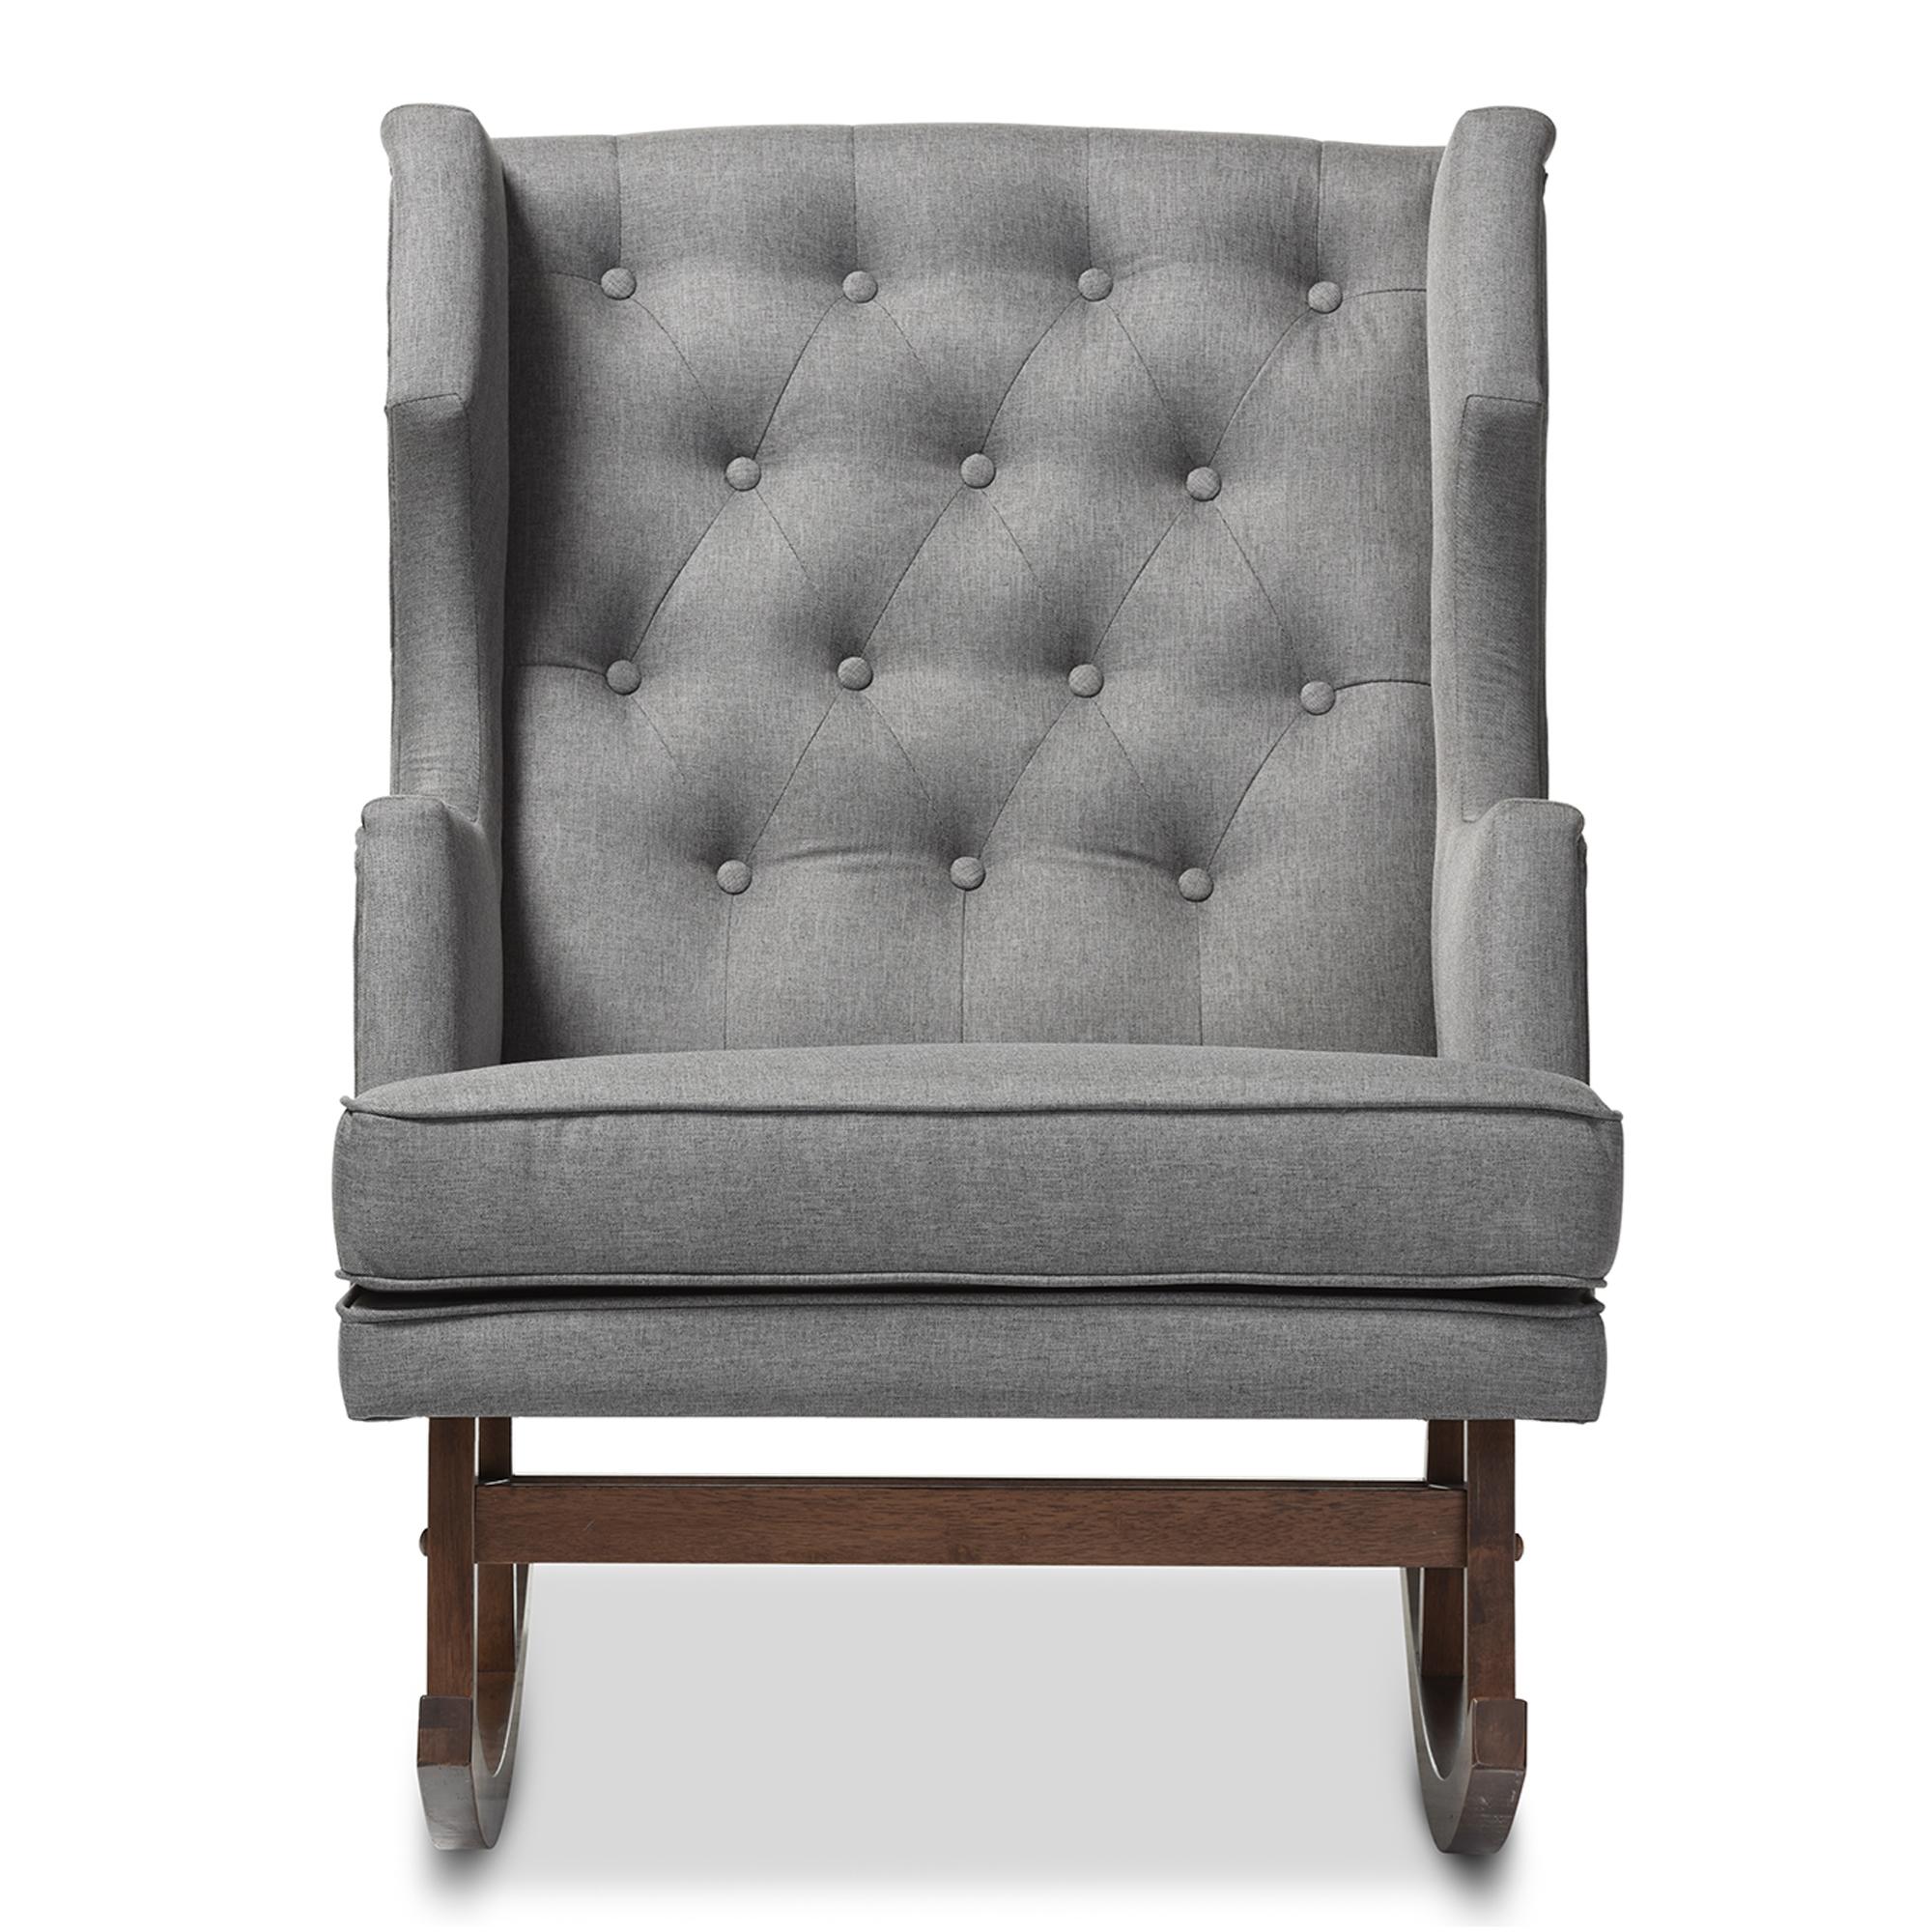 baxton studio iona midcentury retro modern grey fabric upholstered wingback rocking